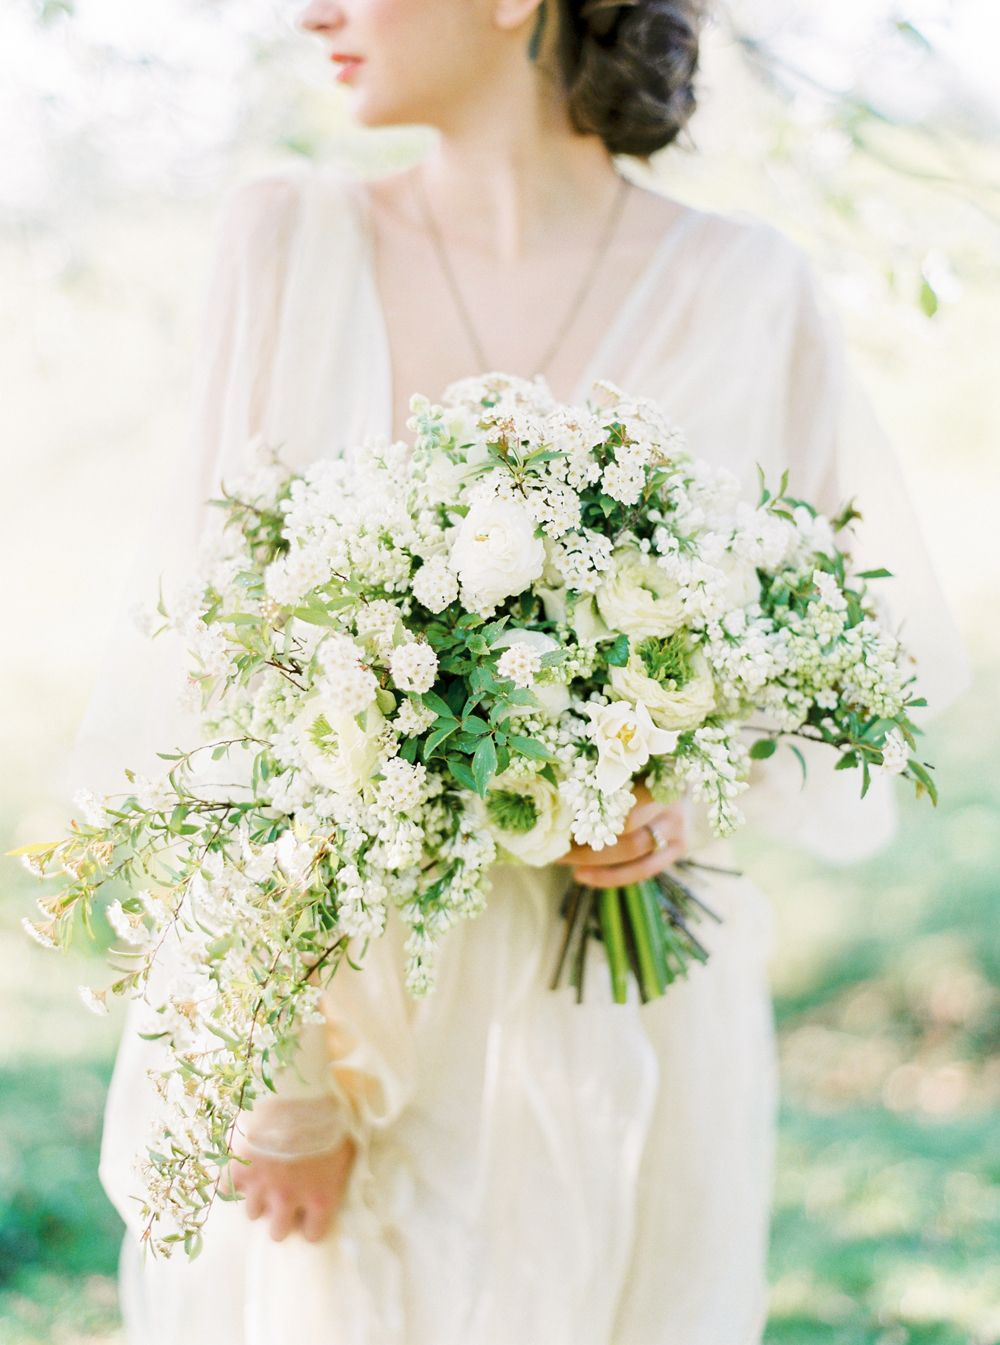 Ethereal countryside wedding inspiration white wedding